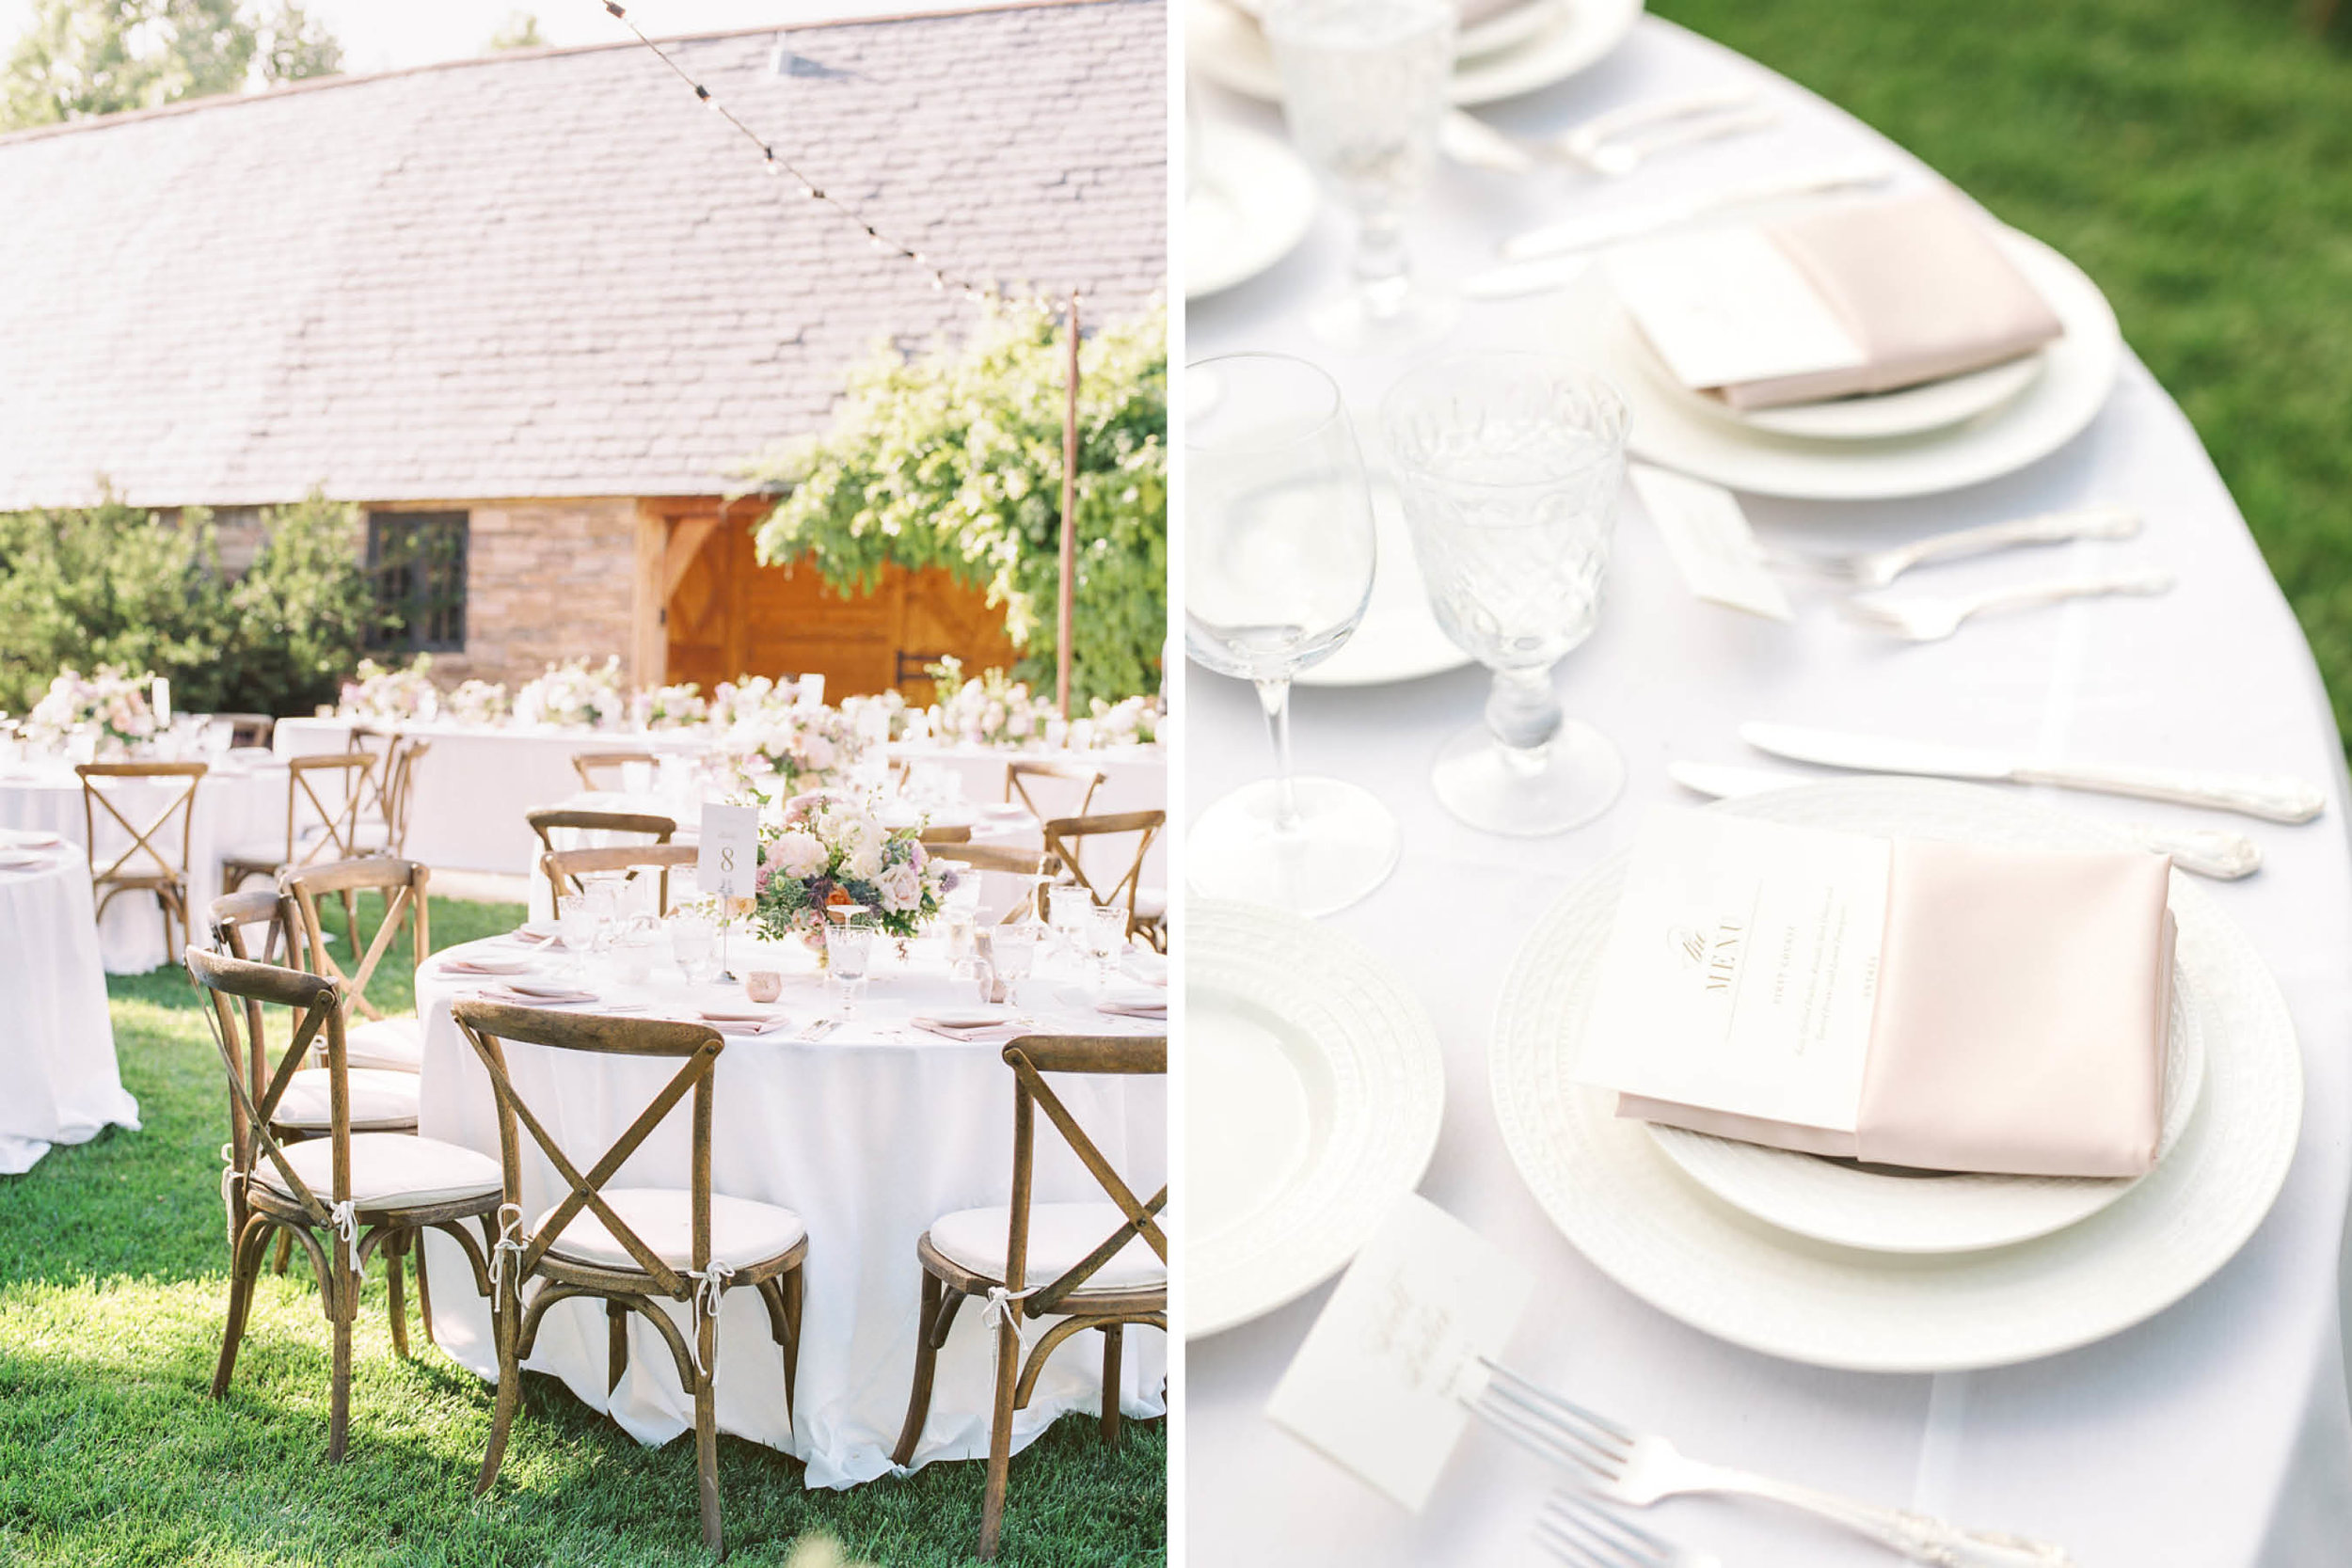 alegria-by-design-wedding-planner-planning-event-design-santa-barbara-day-of-coordinator-kestrel-park-santa-ynez-fields-castle-lavender-garden-mrs-box (44).jpg